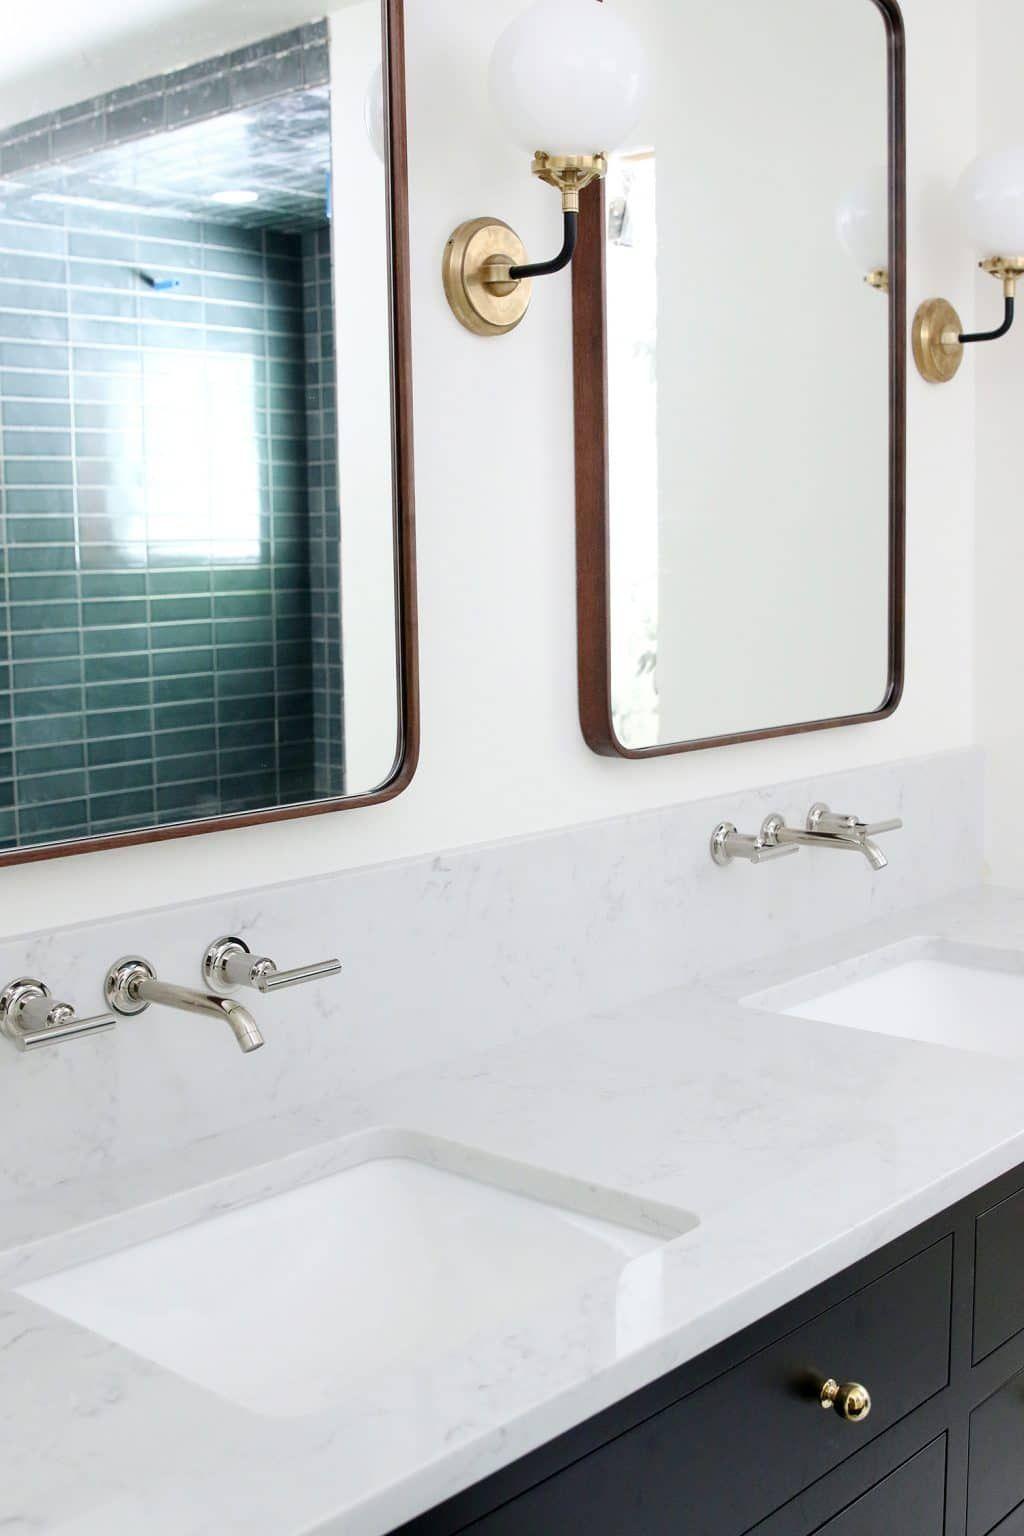 Our Undermount Bathroom Sink Wall Mount Faucets Installed Wall Mount Faucet Bathroom Undermount Bathroom Sink Wall Mount Faucet